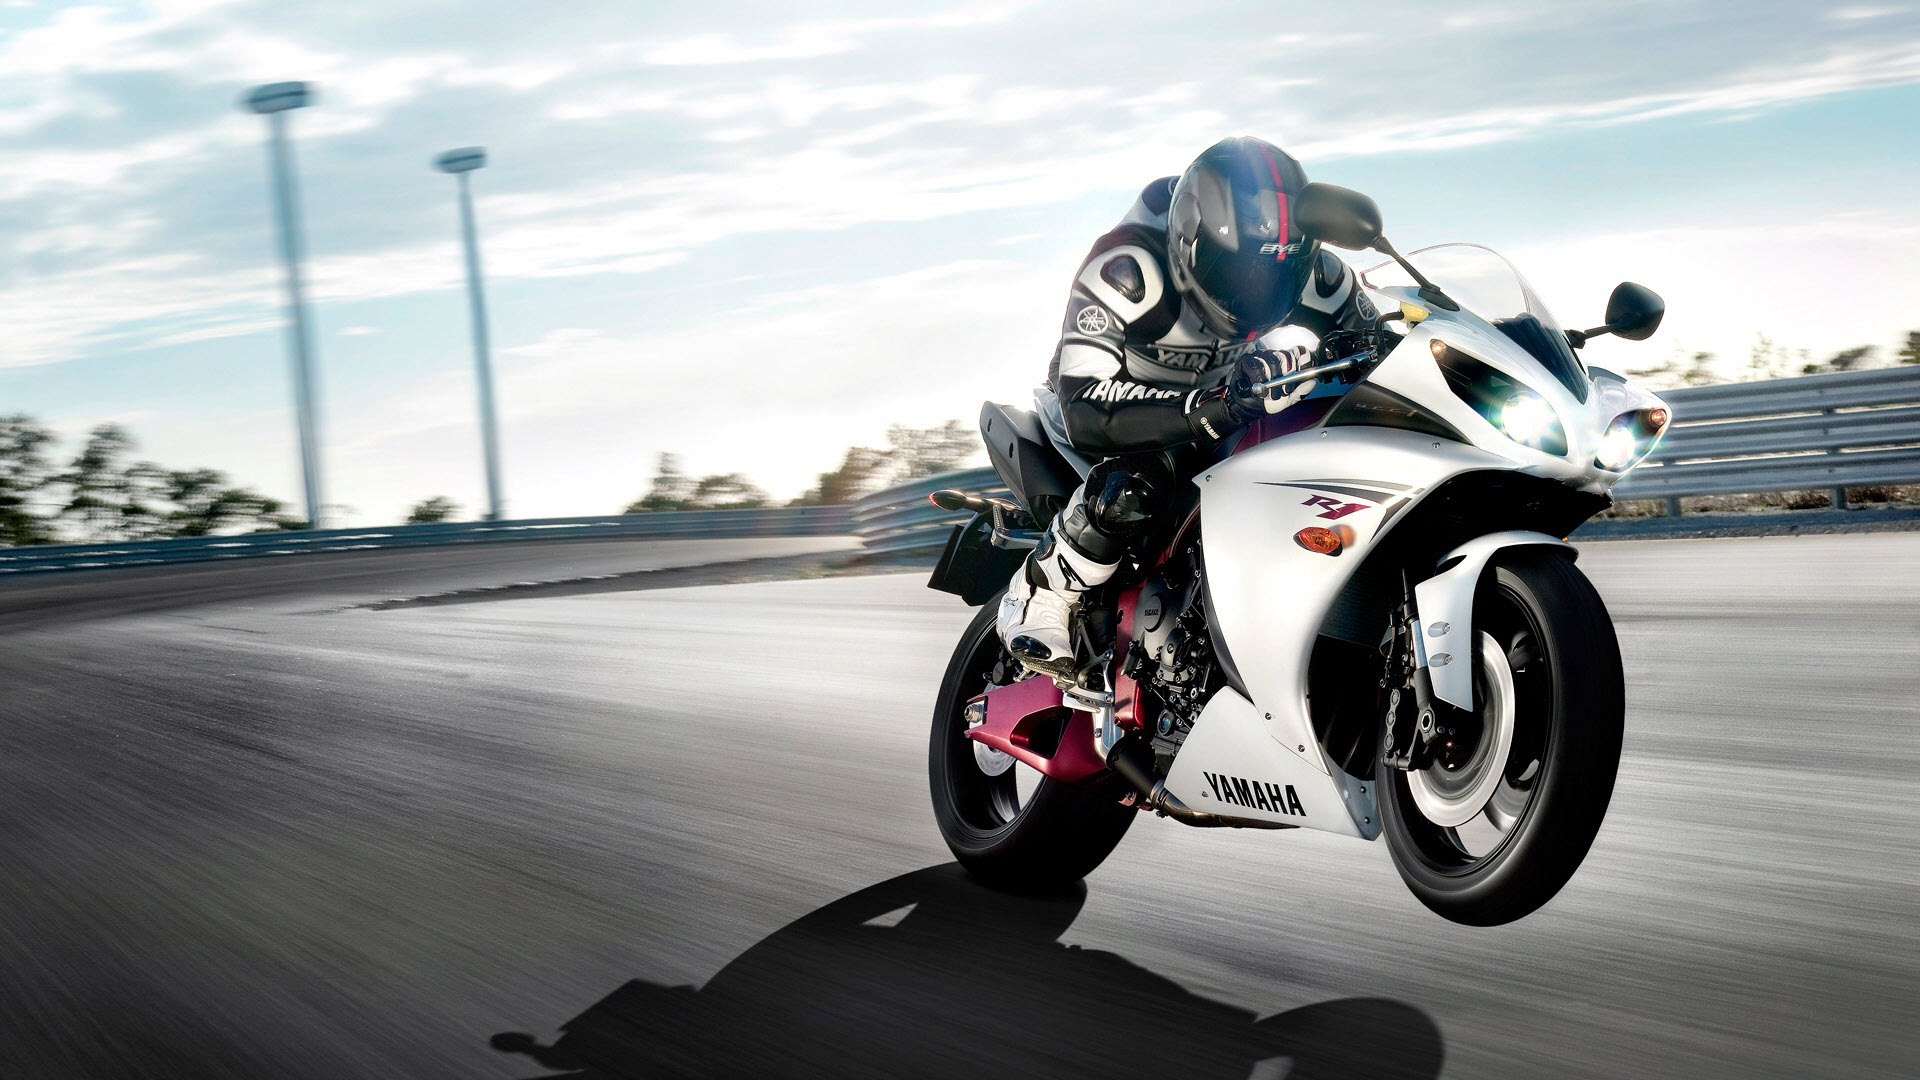 R1 Yamaha Motorcycle - R1 Yamaha Motorcycle